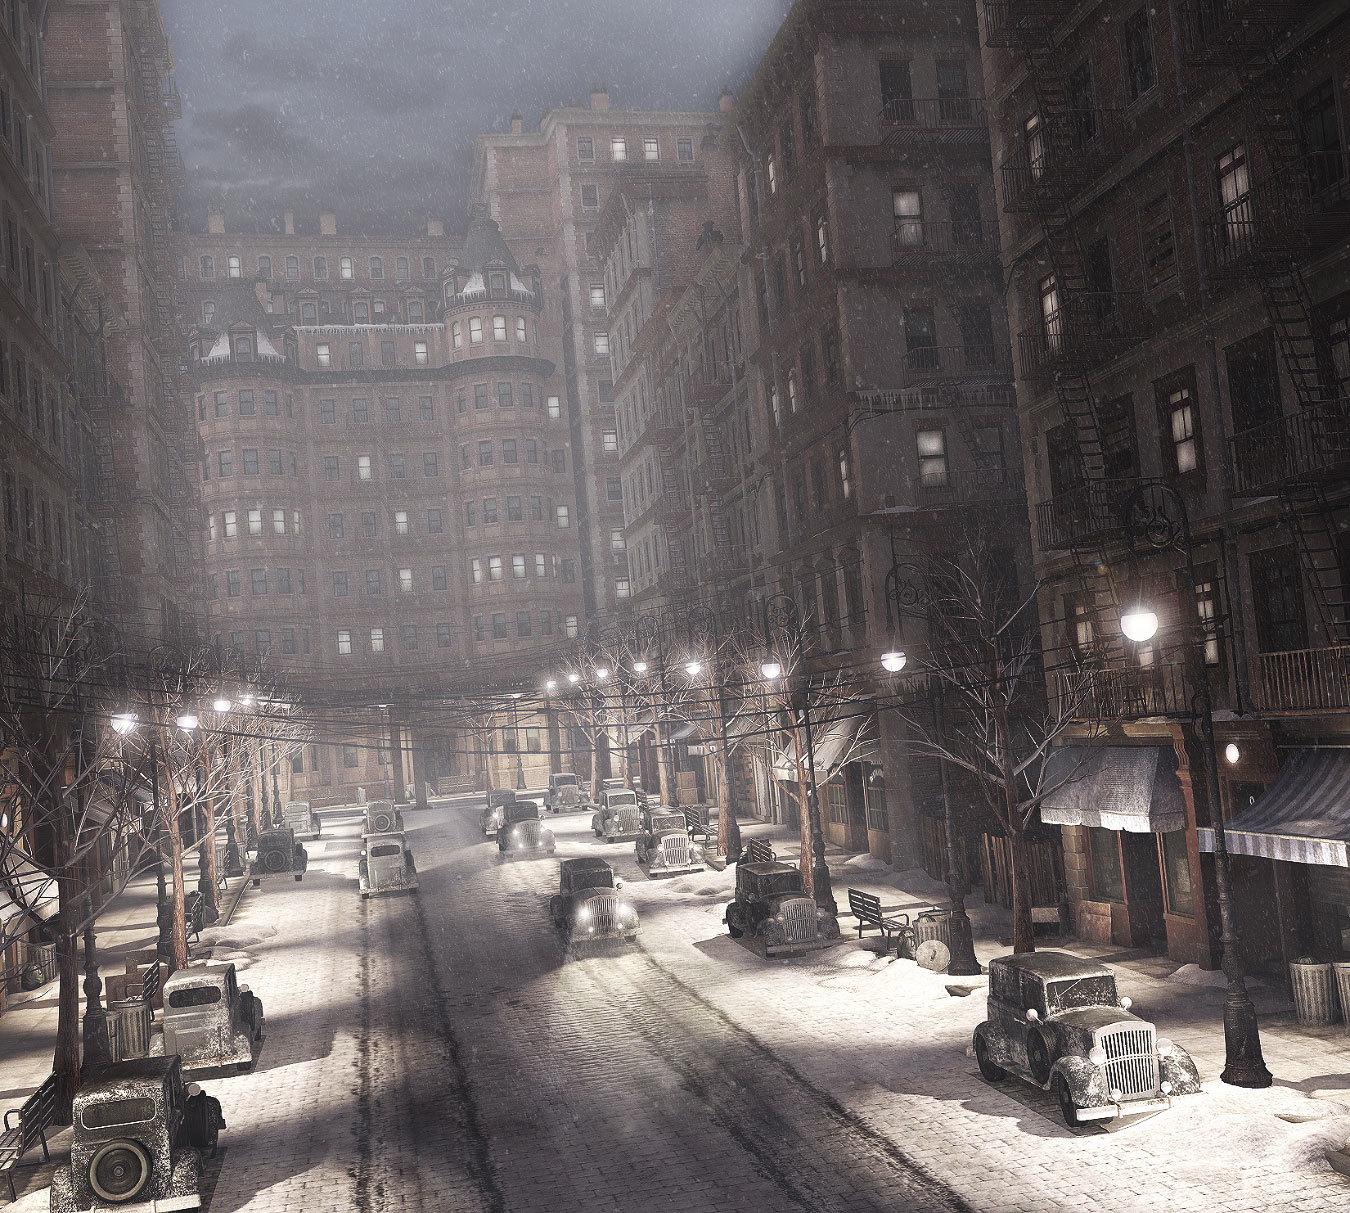 Kaesar30 night american city  1 b19f75c7 daye